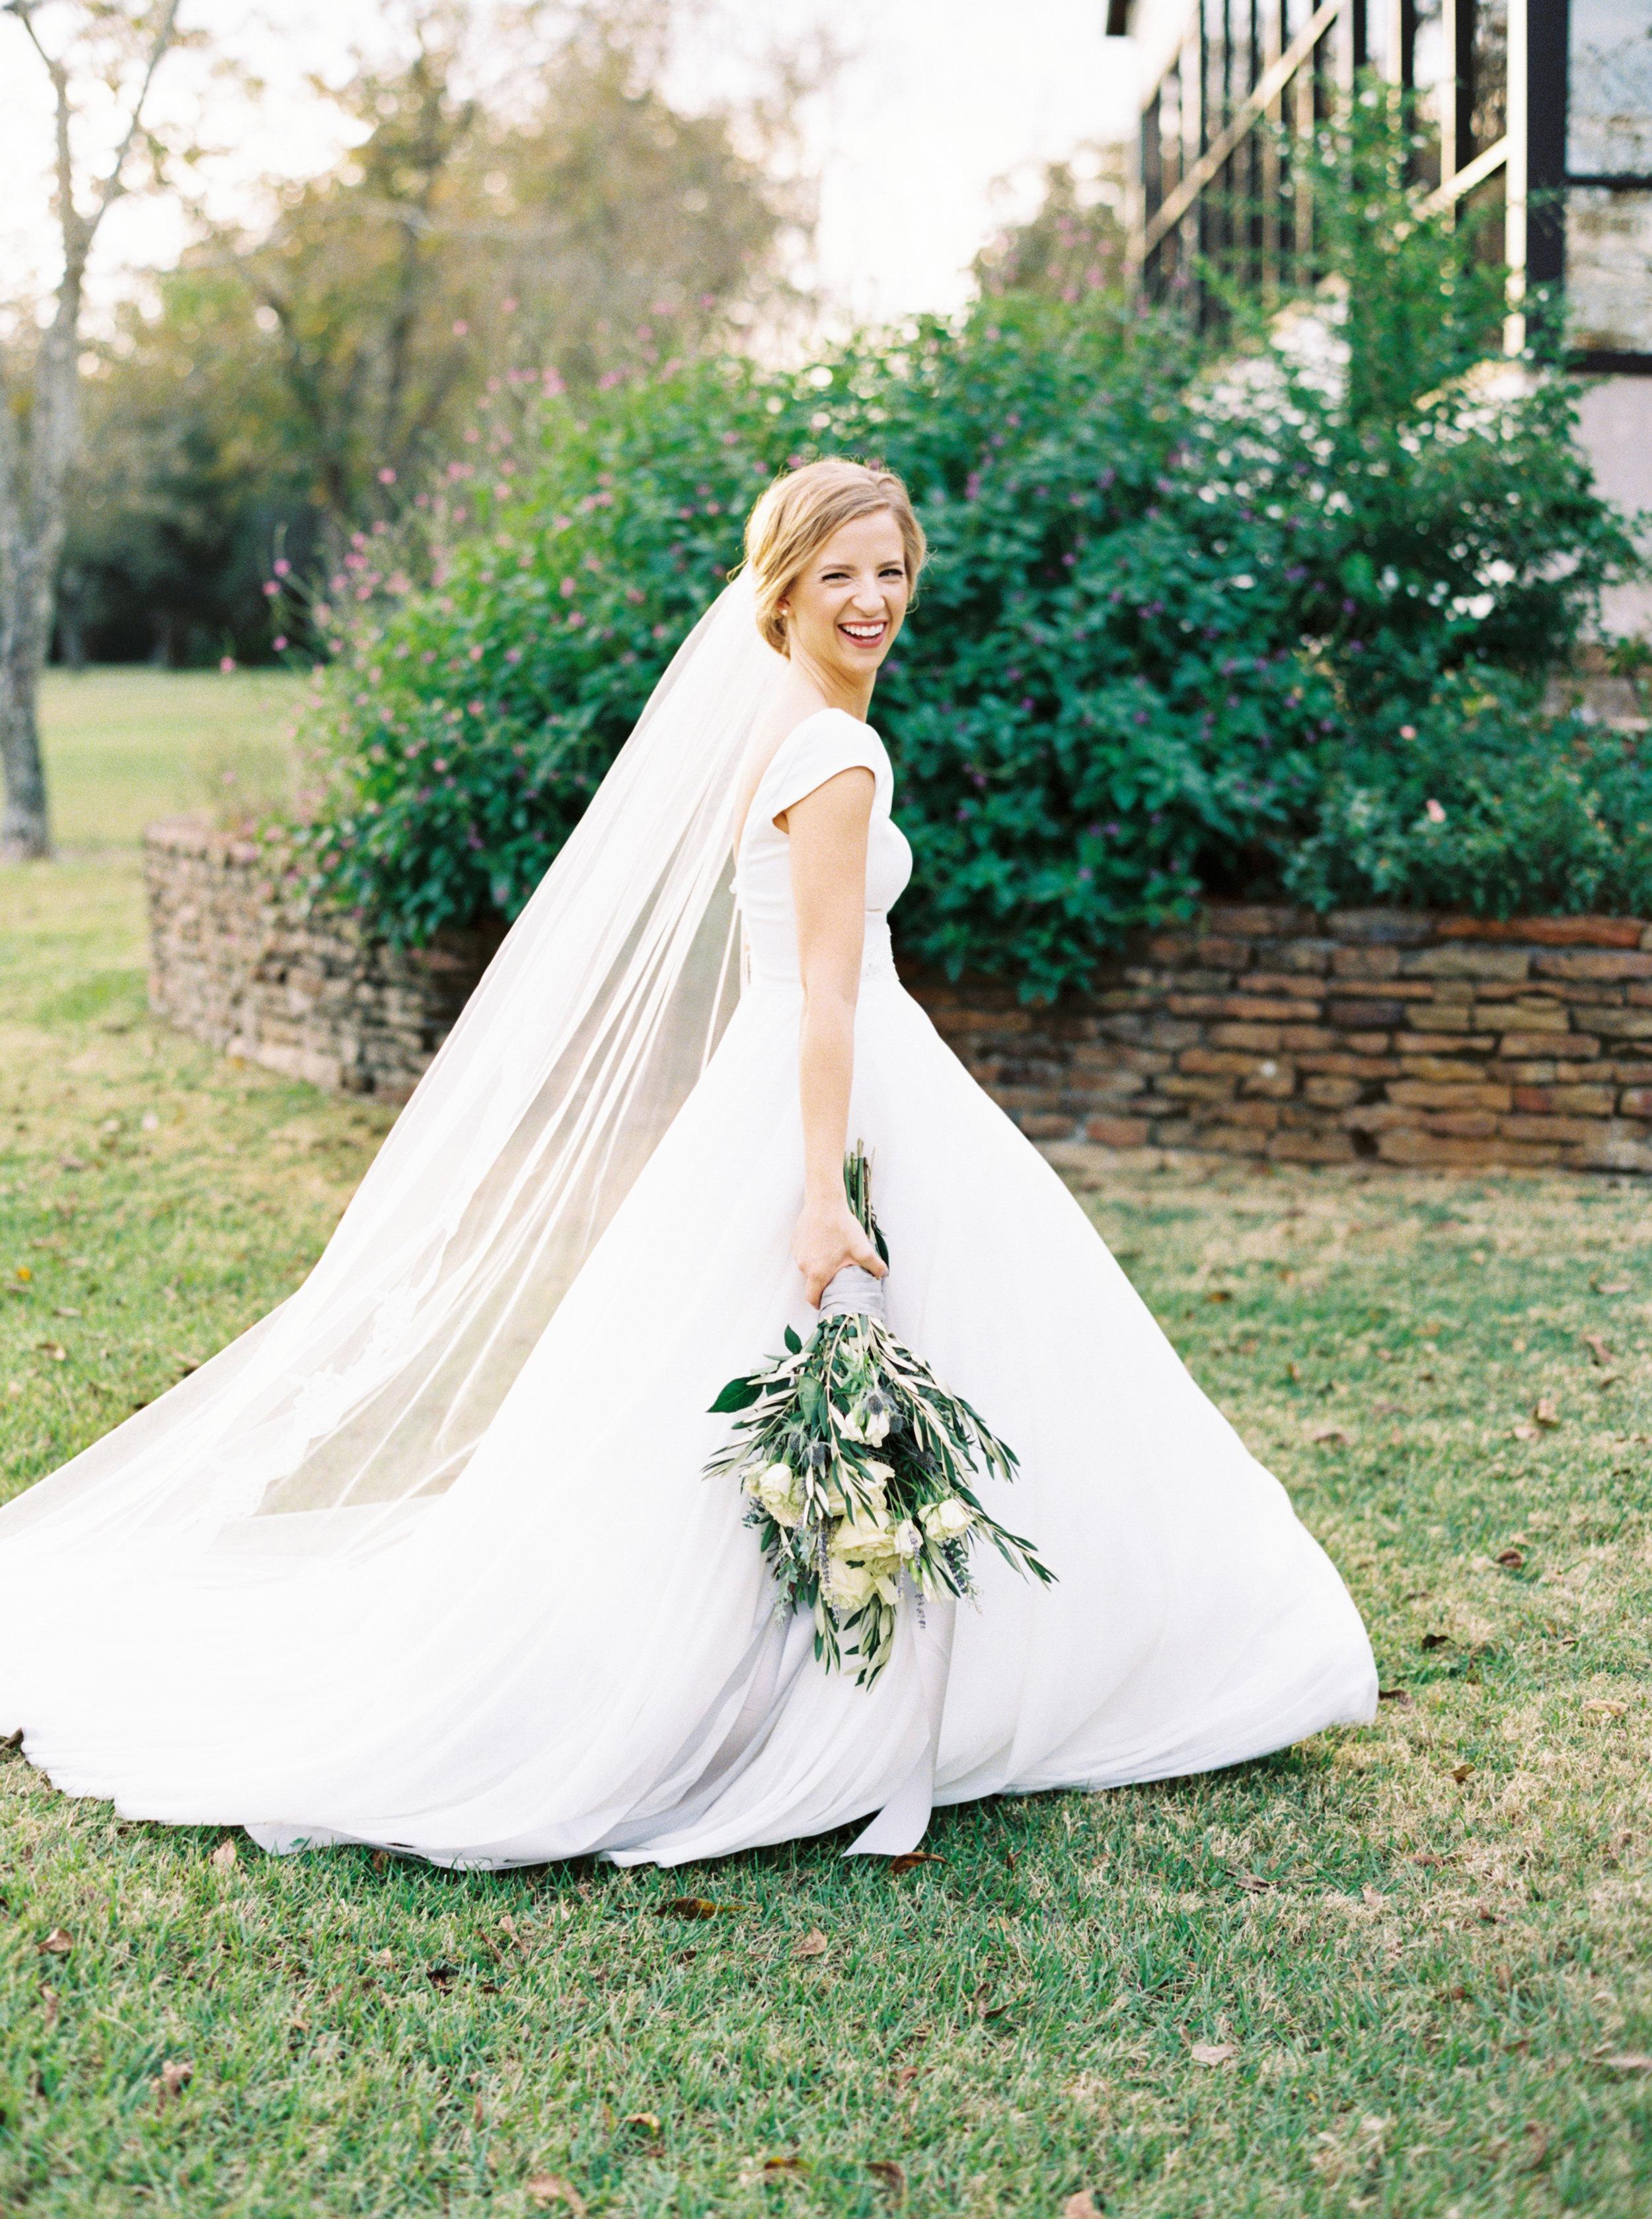 French Bridal Portraits